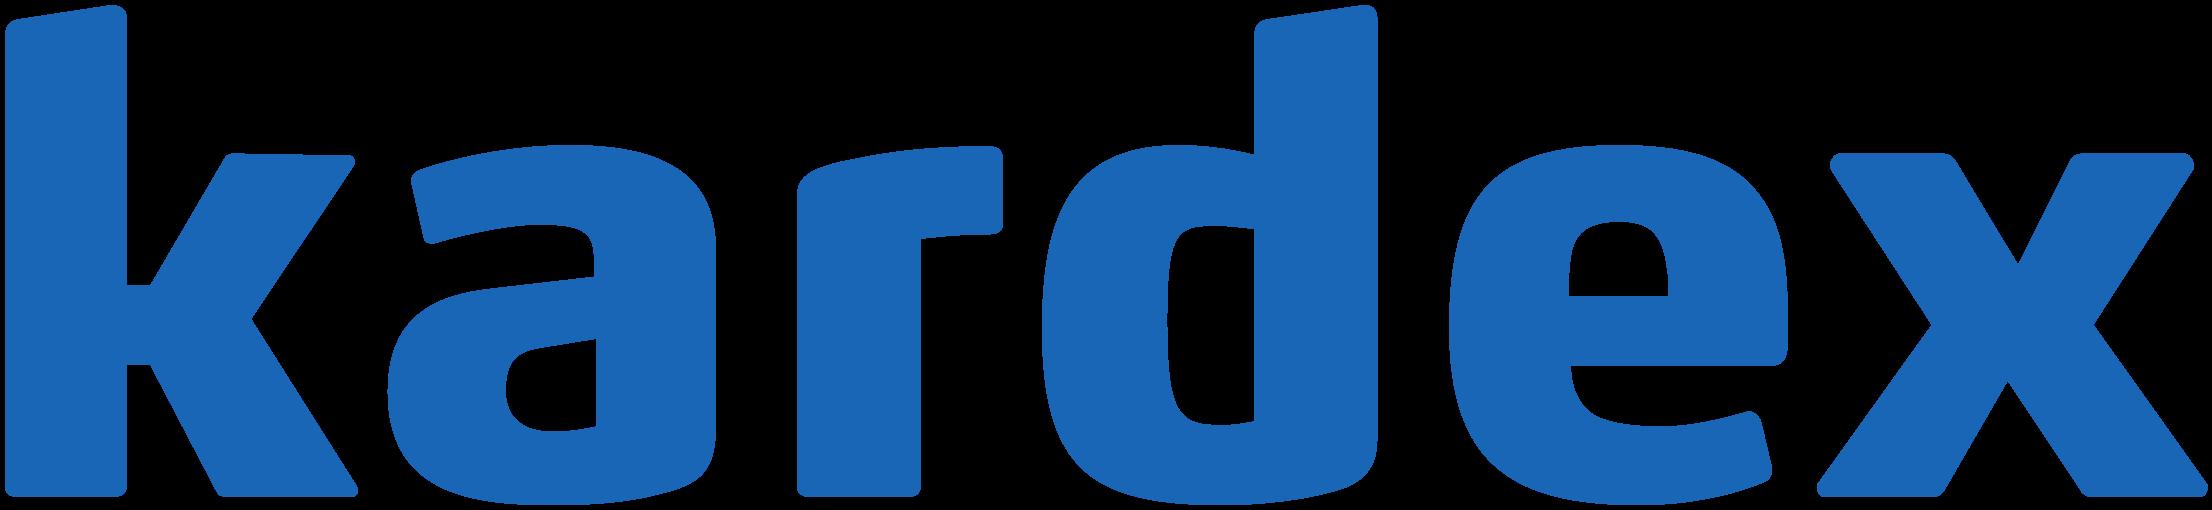 Cardex Logo photo - 1